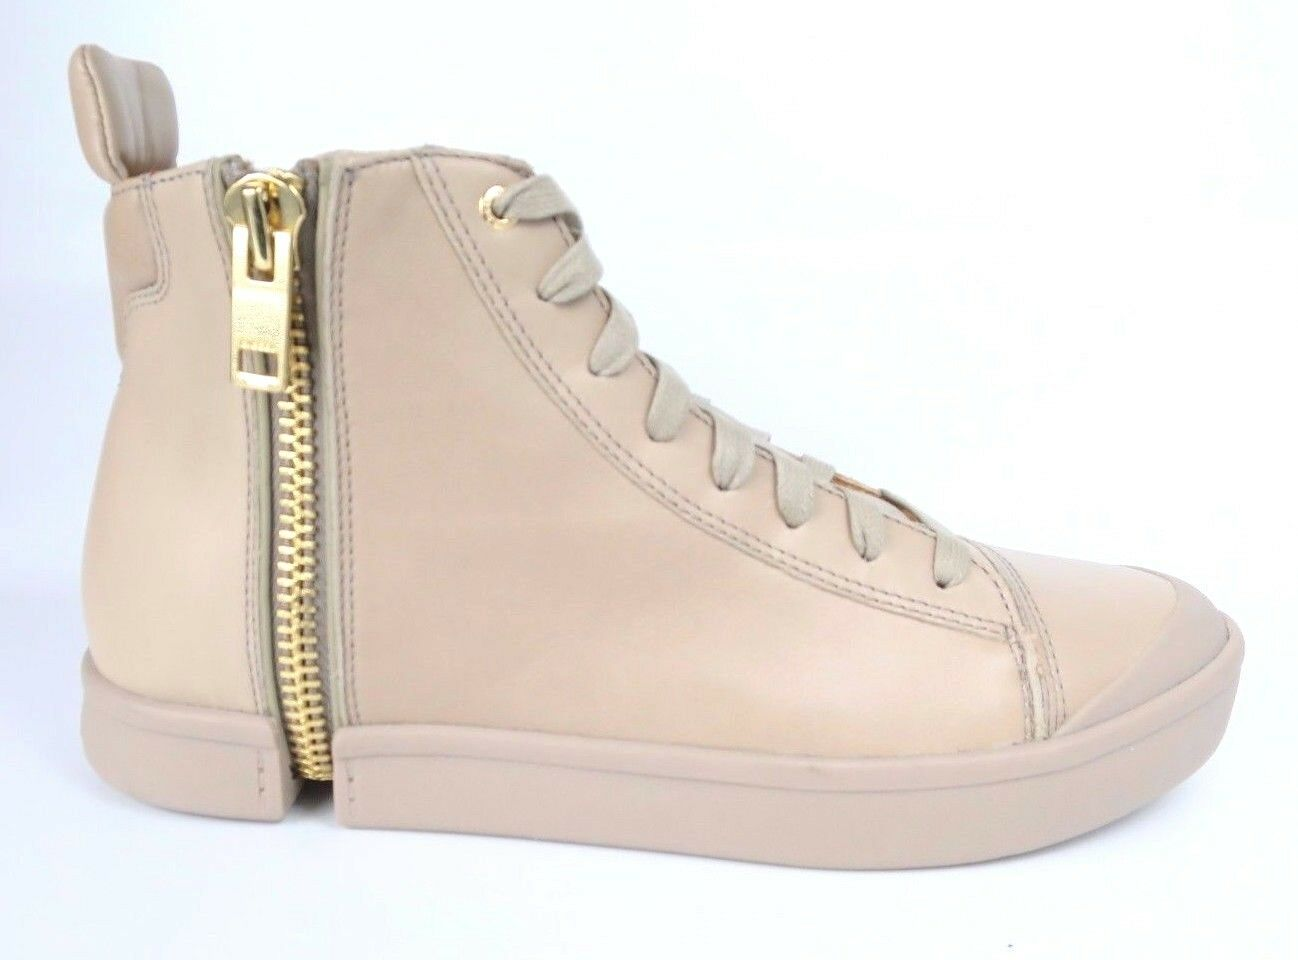 DIESEL S-nentish scarpe da ginnastica over uomo scarpe Uomo shoes over ginnastica ZIP AROUND Stivali n14 2fd77e